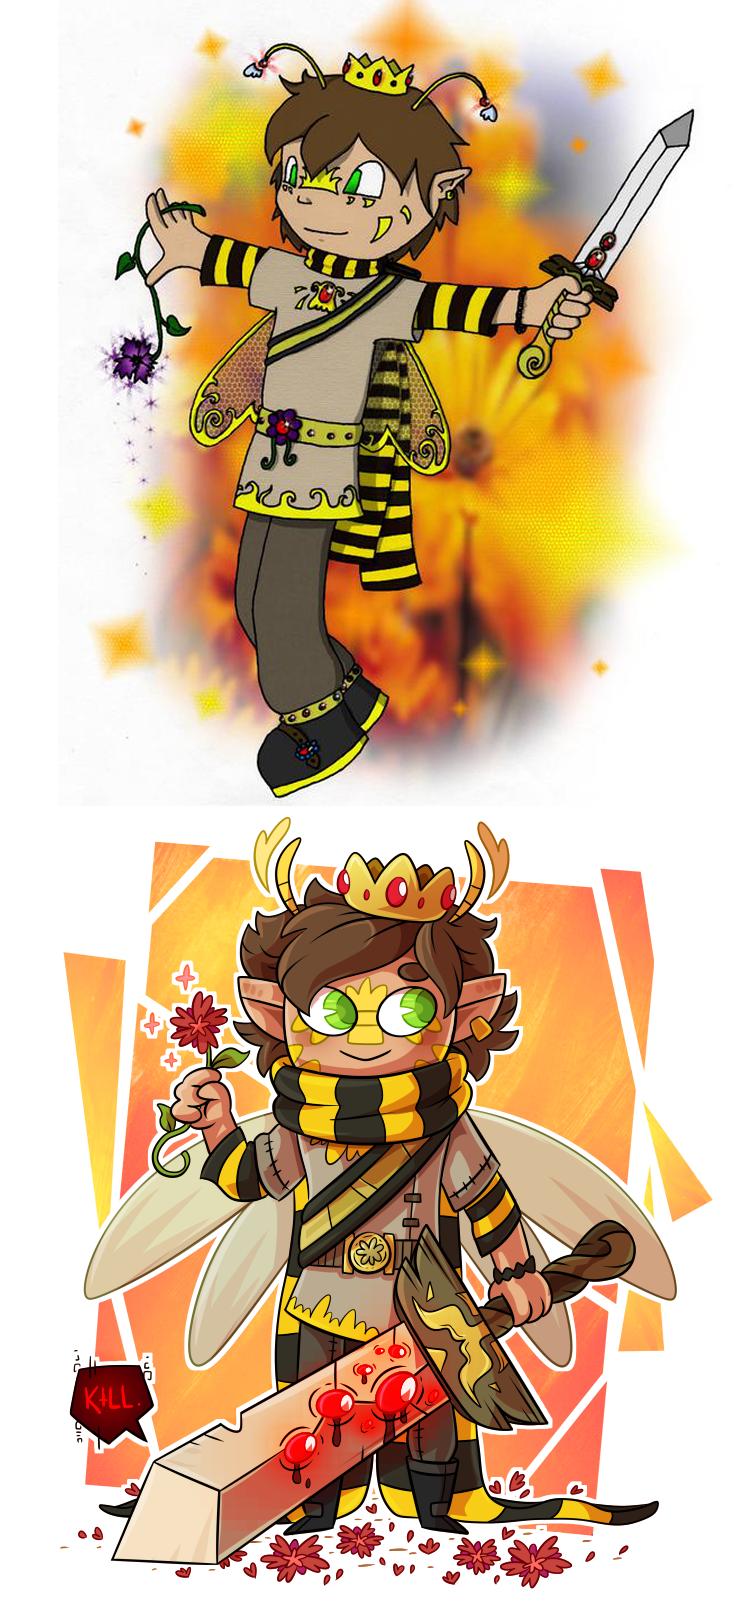 Bee Prince (Redrawing) - 2008/2019